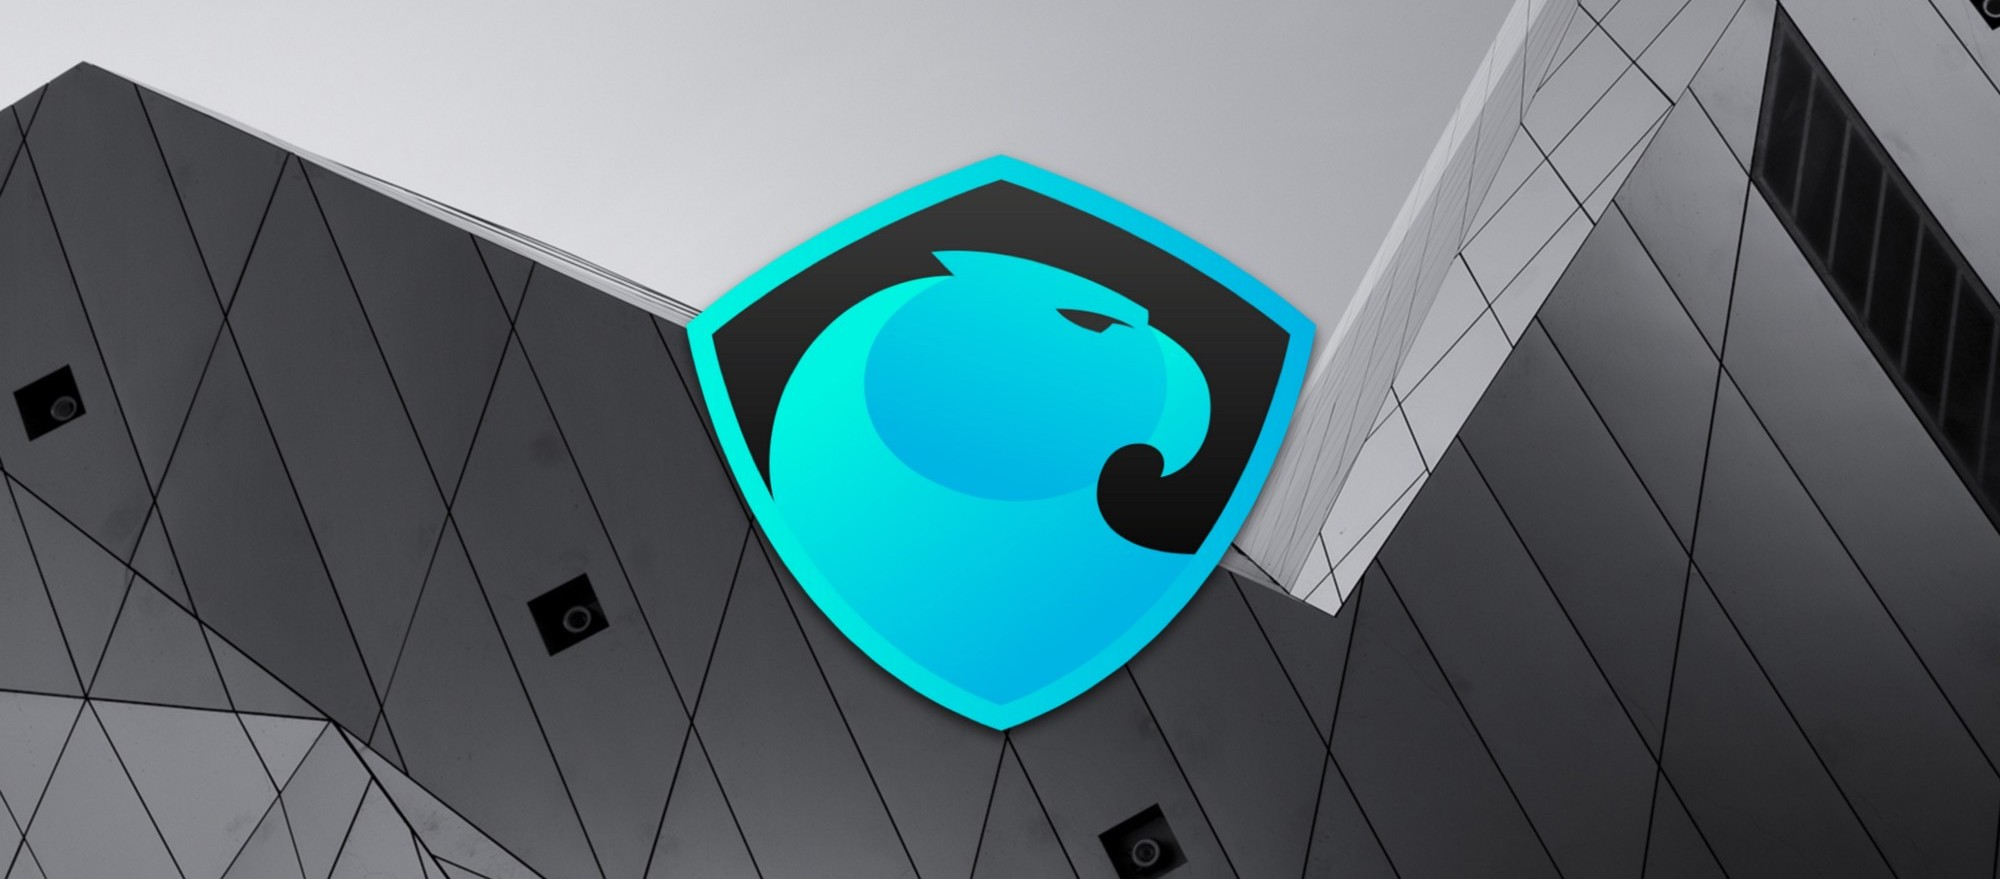 Jak založit svoji firmu (DAO) v blockchainu